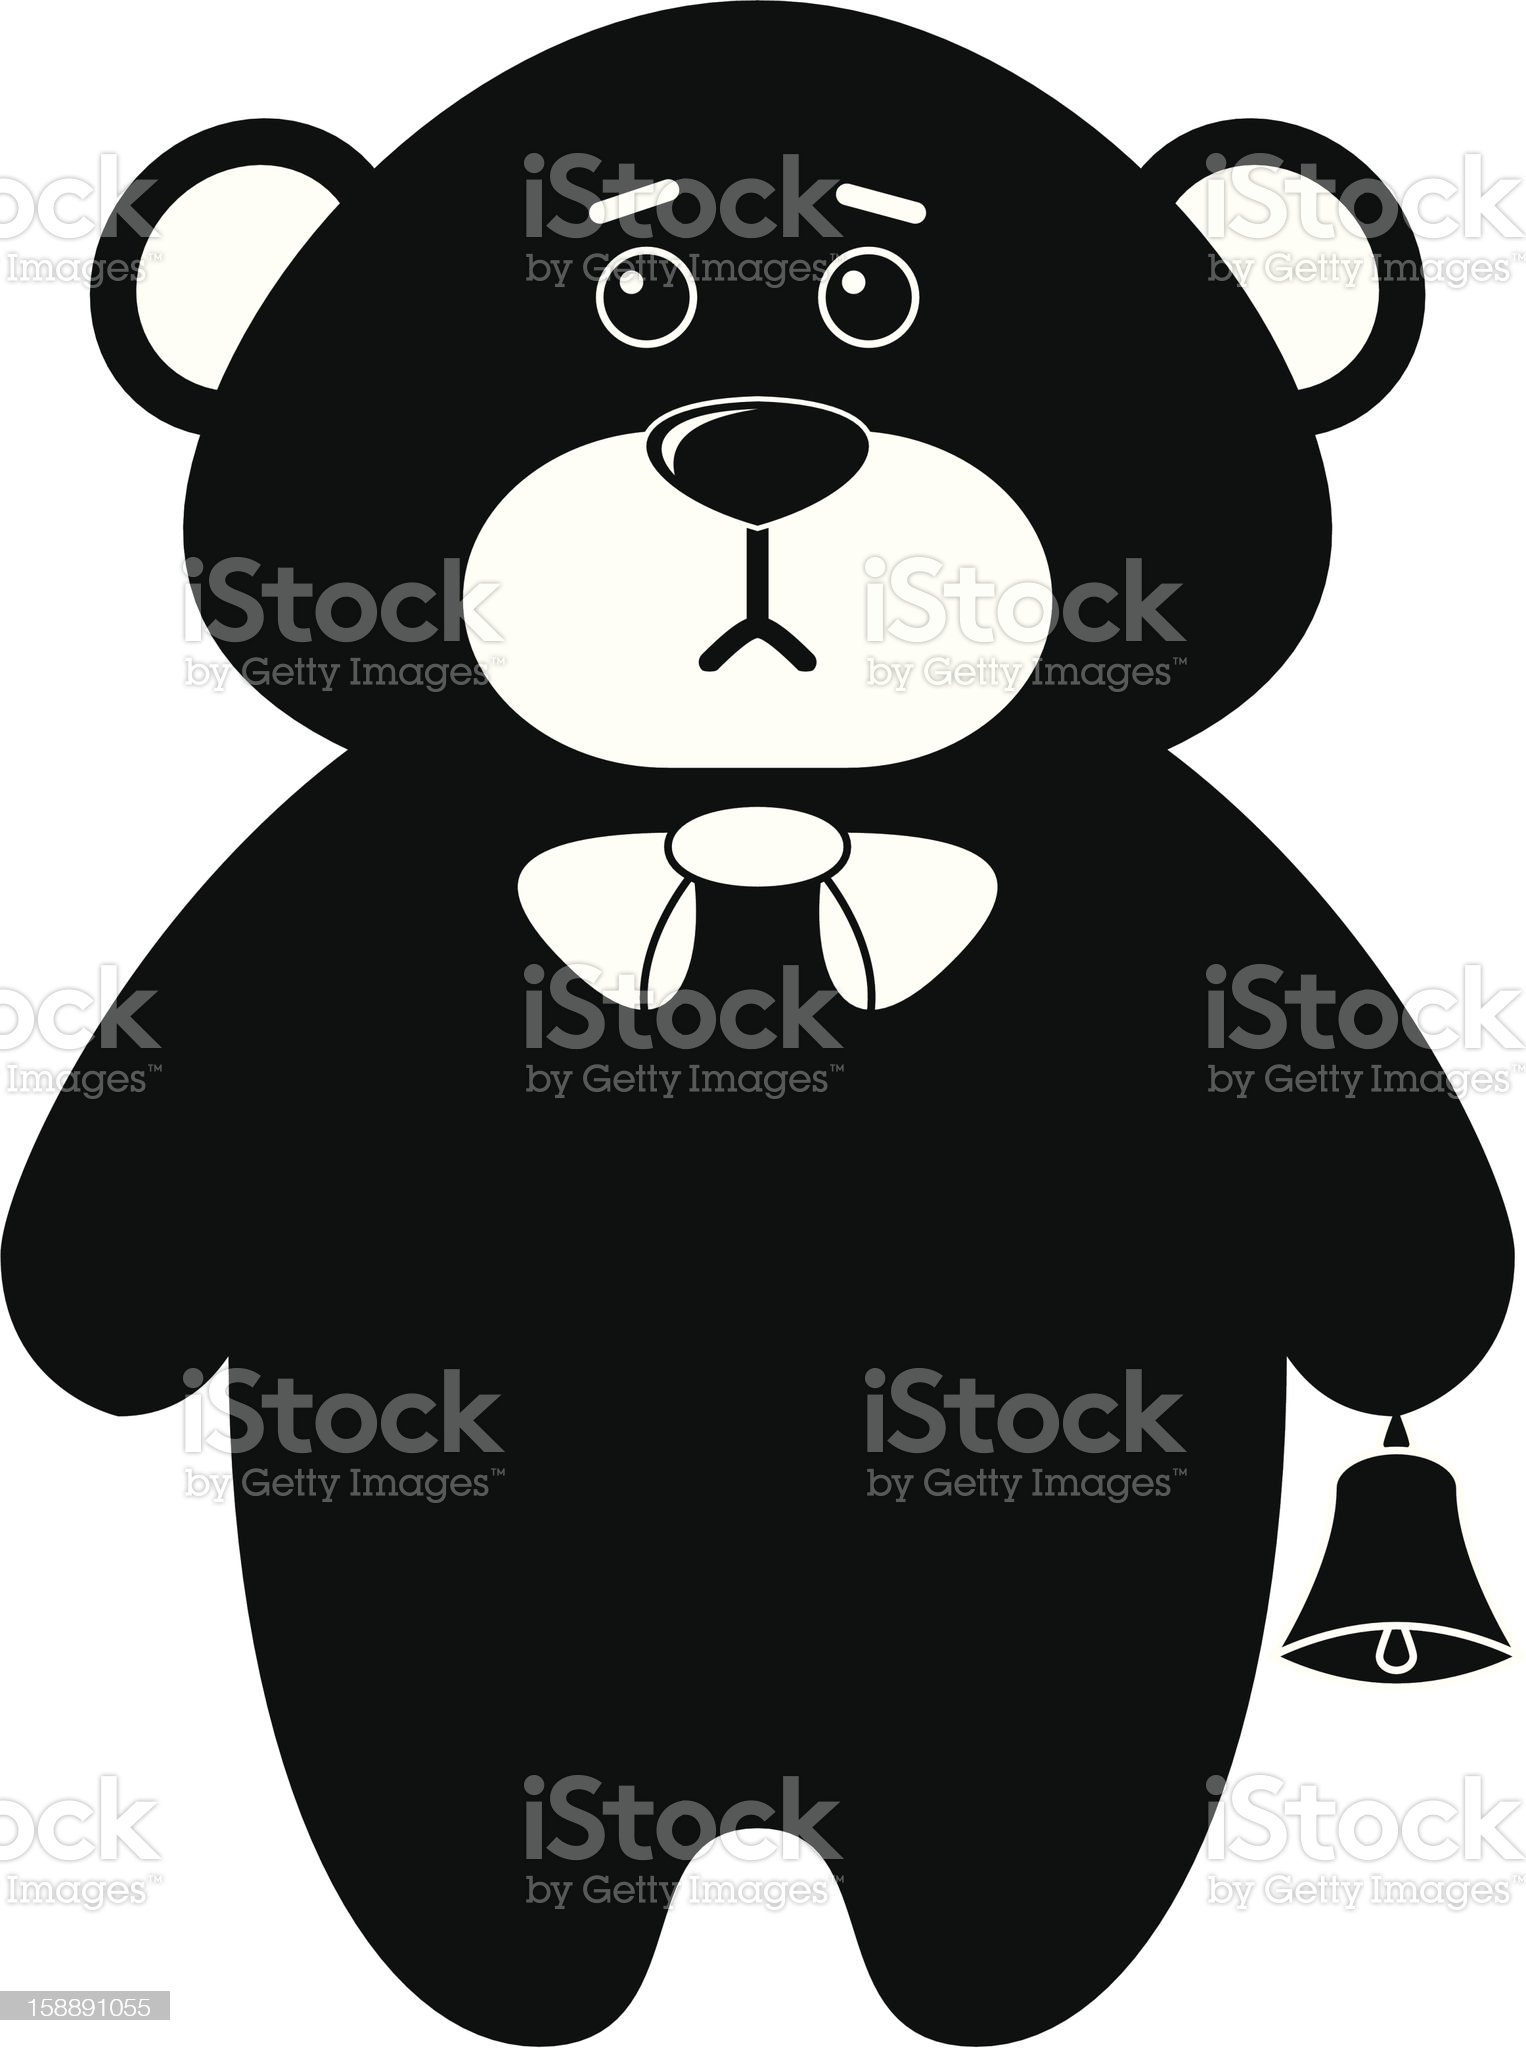 Teddy bear a tilde, silhouette royalty-free stock vector art